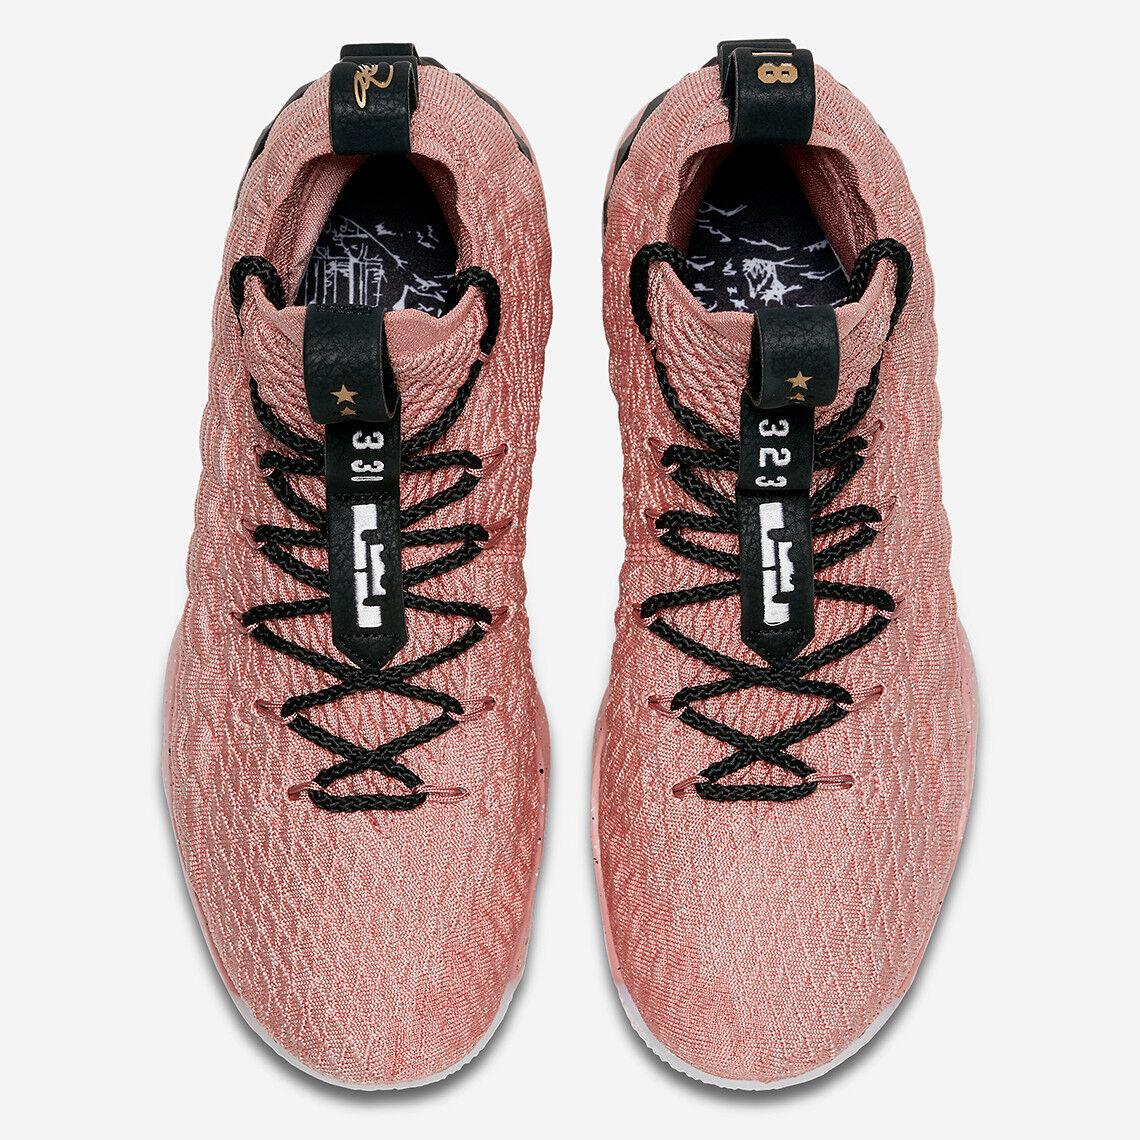 Nike LeBron XV 15 Hollywood All Star Star Star Size 7.5. 897650-600. Rust Pink gold Black d17b0d